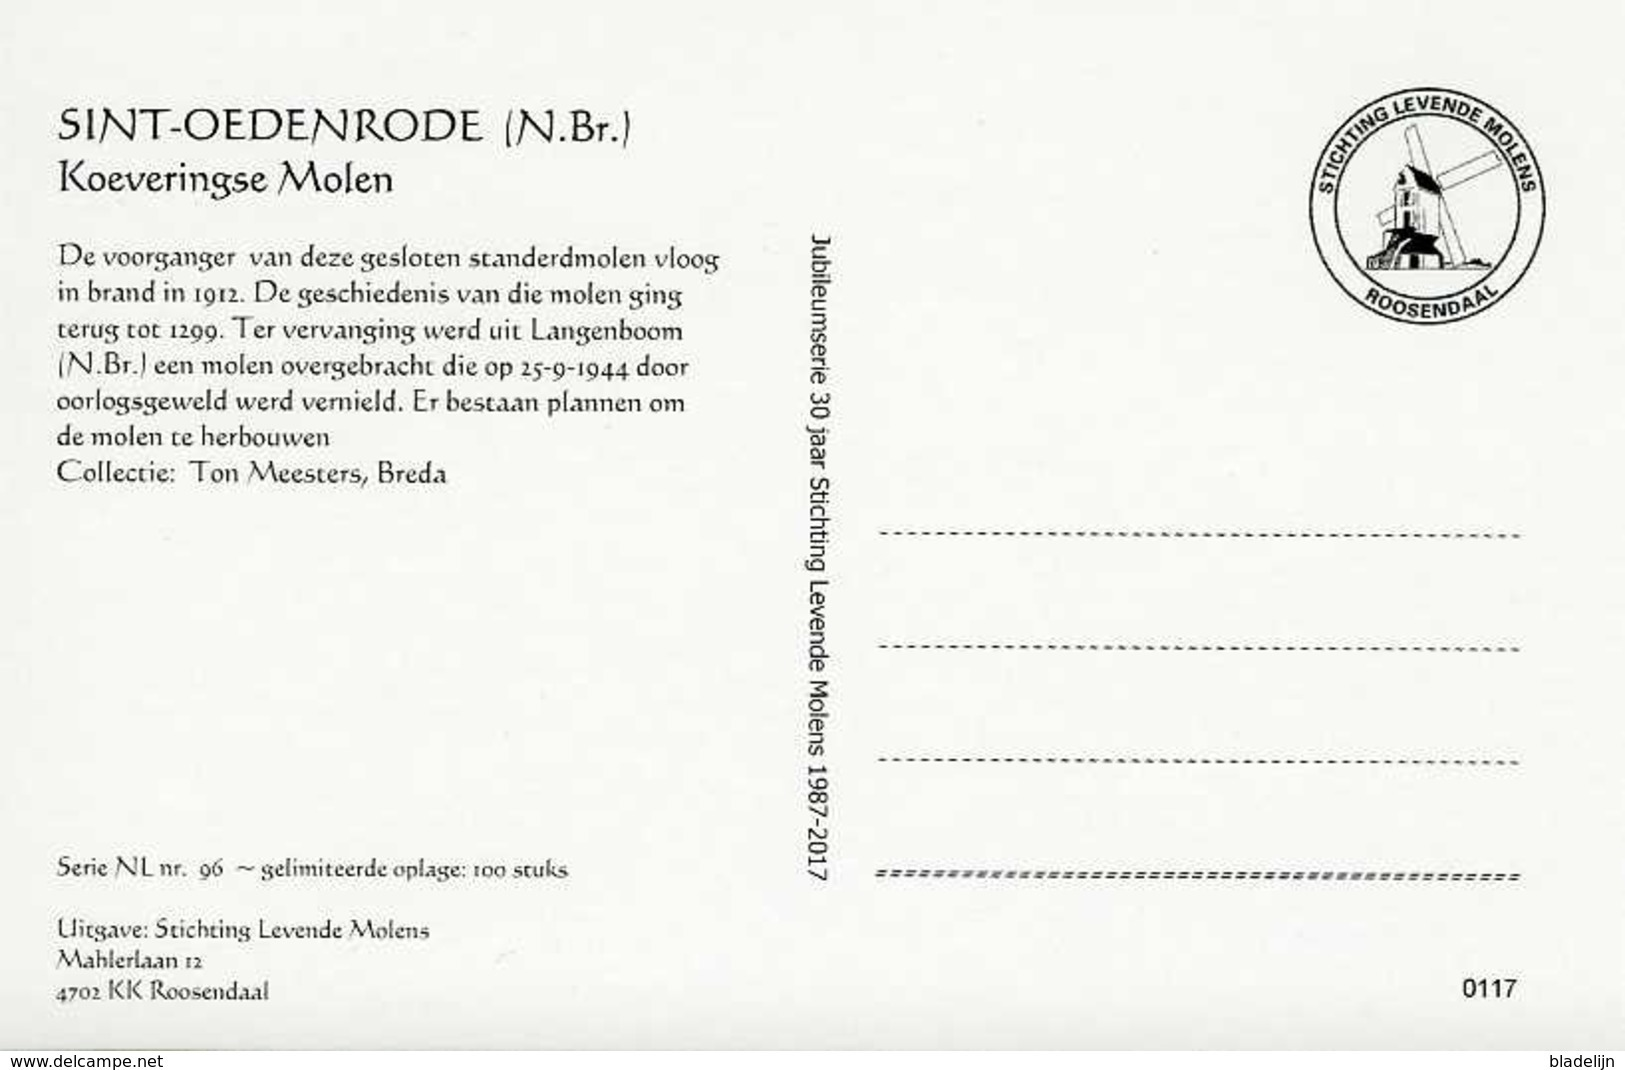 SINT-OEDENRODE - Meierijstad (N.Br.) - Molen/moulin - De Verdwenen Koeveringse Standerdmolen Omstreeks 1930 - Nederland